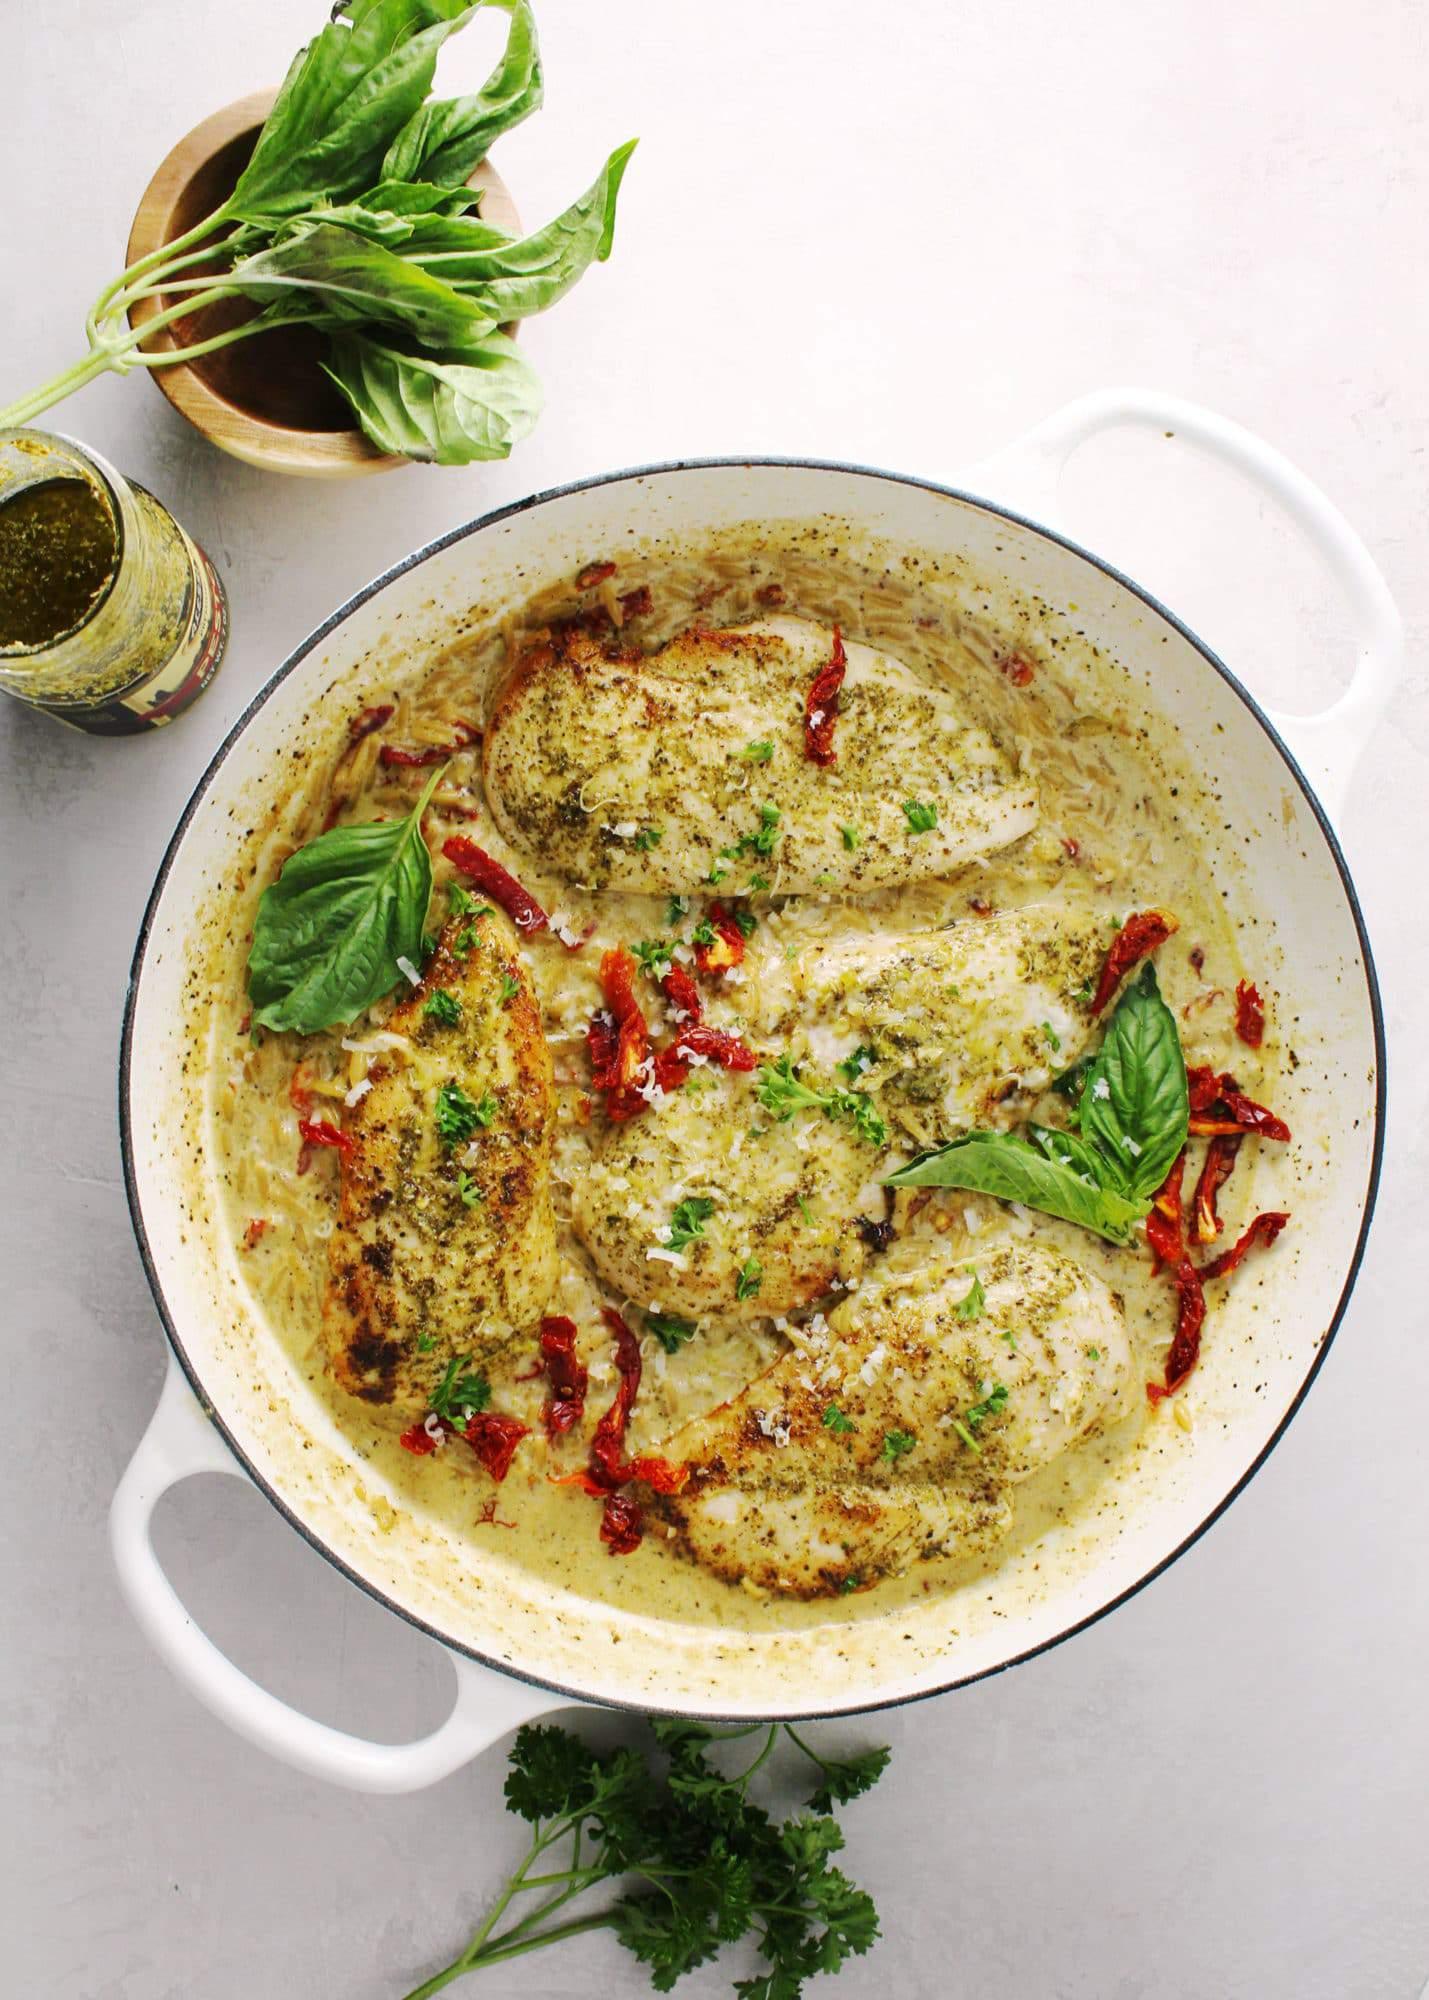 Creamy Basil Pesto Chicken